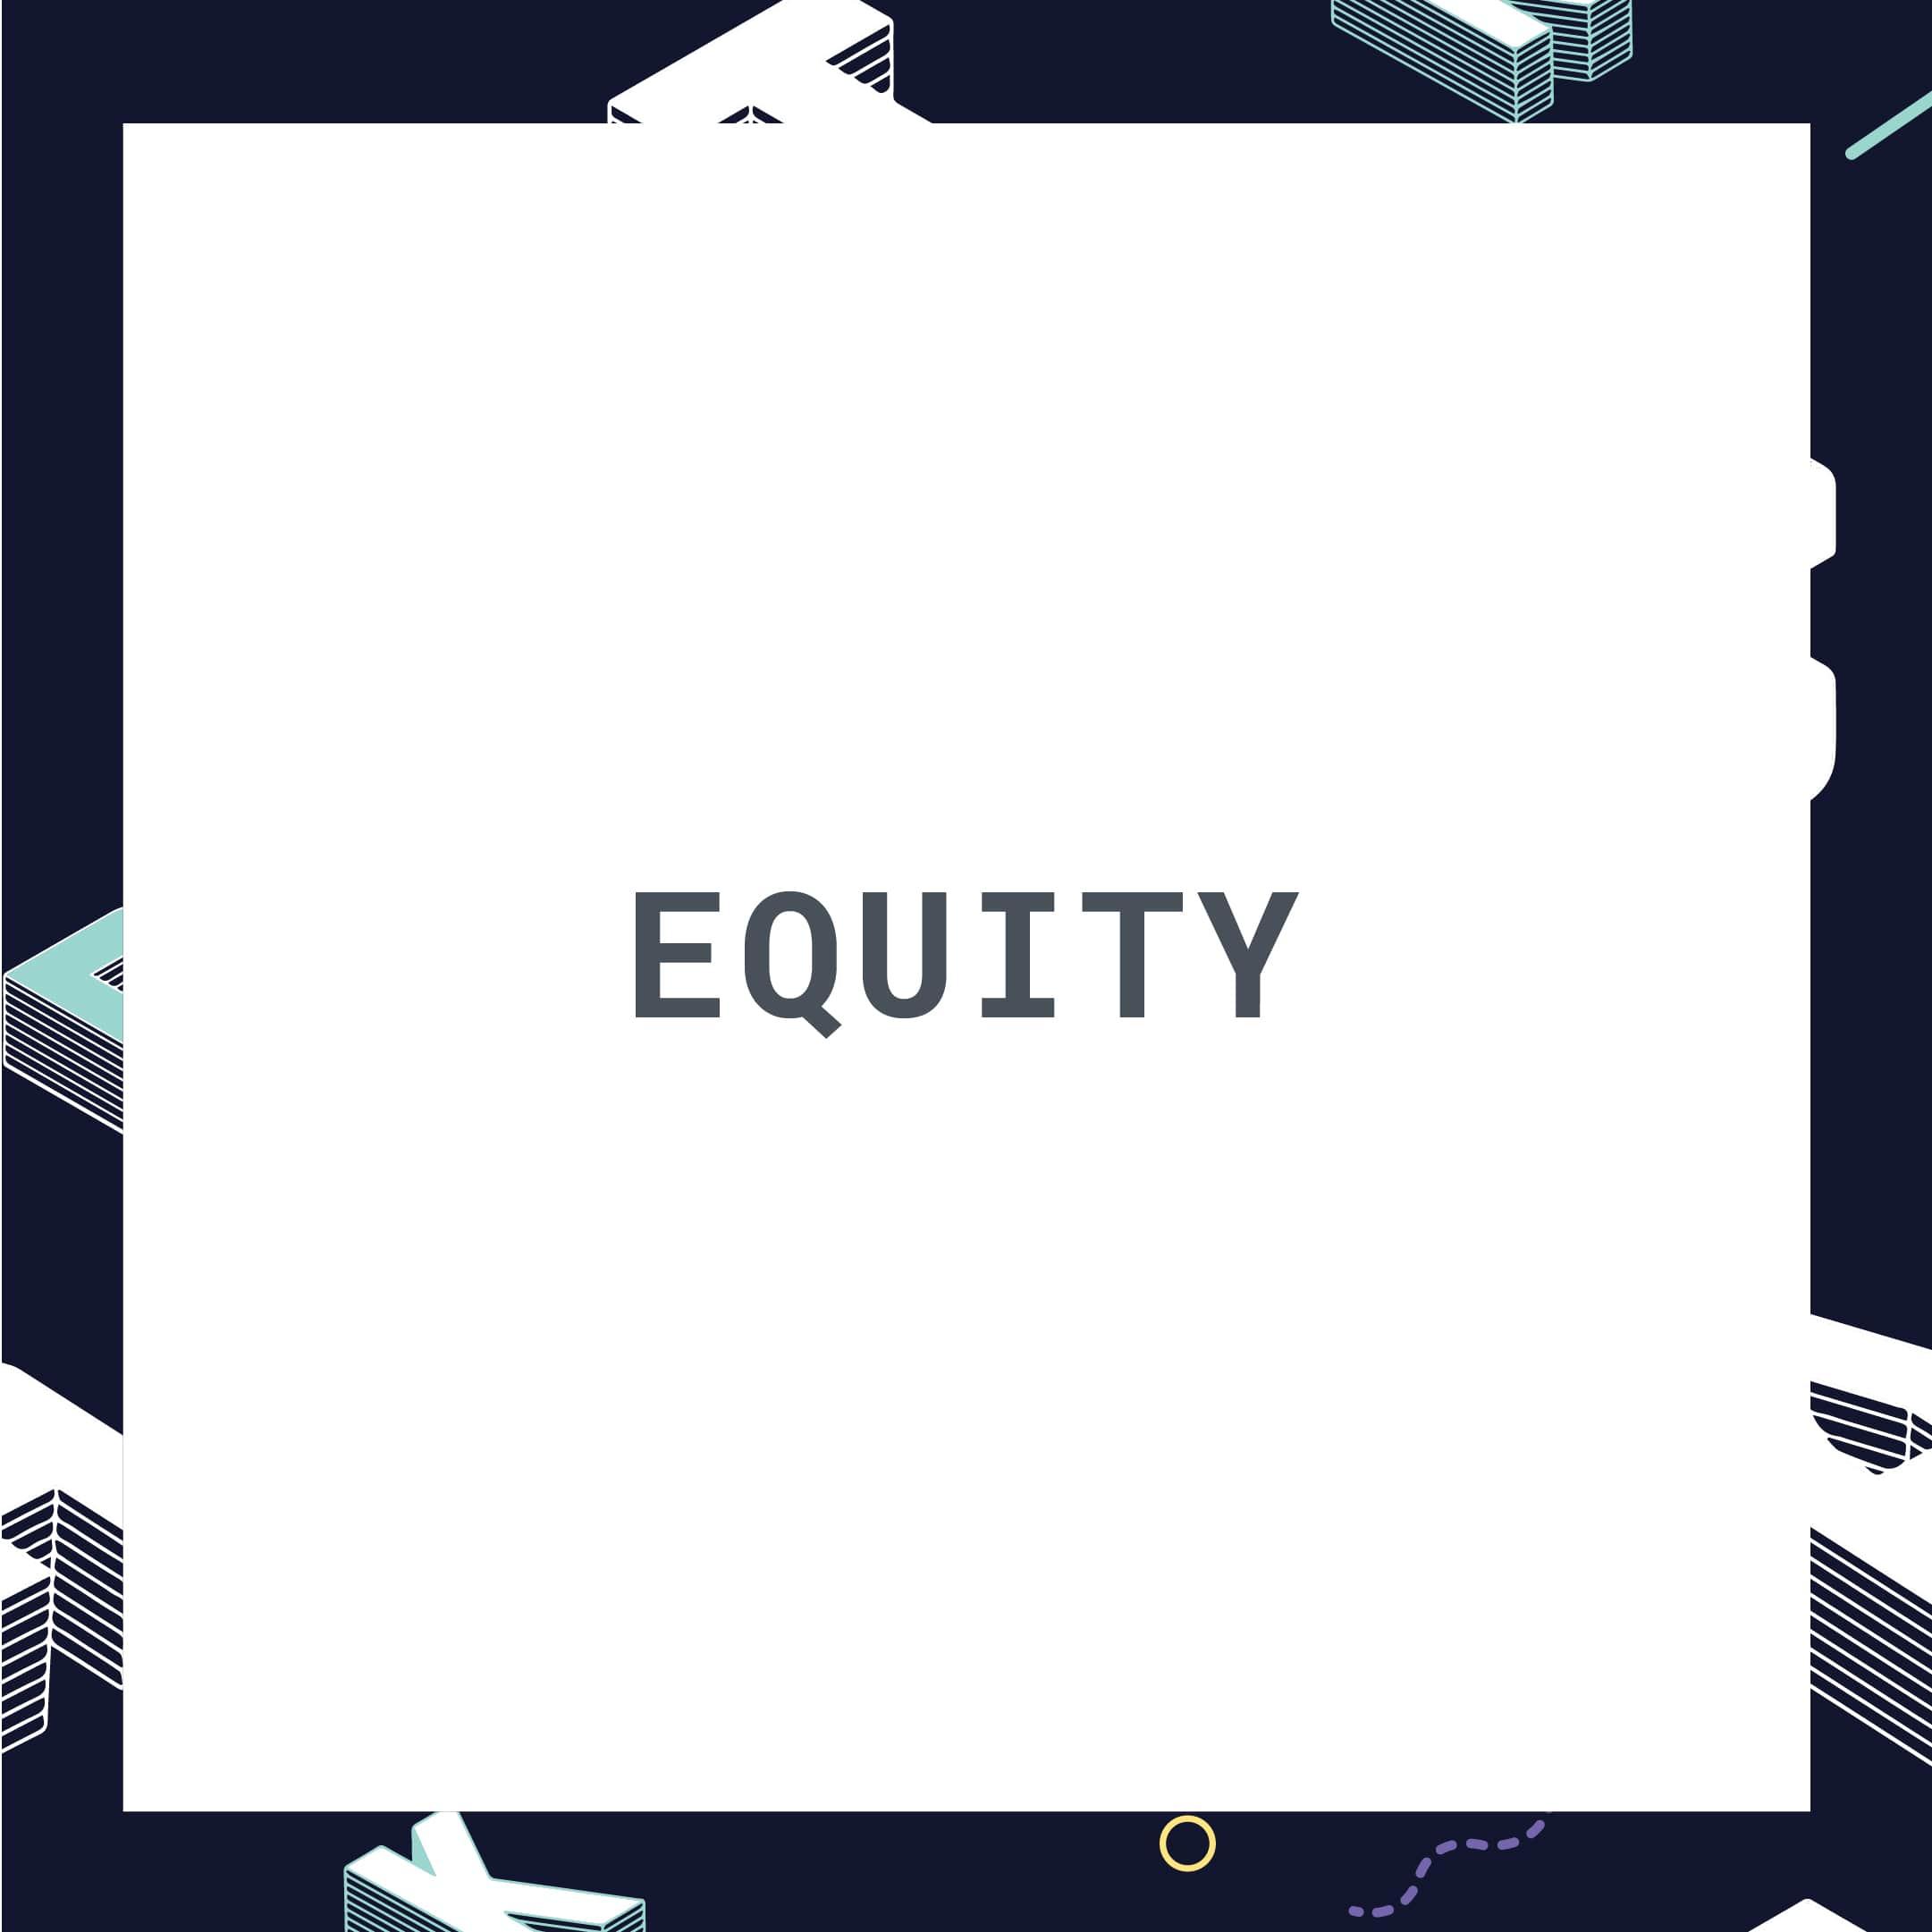 equity-min.jpg